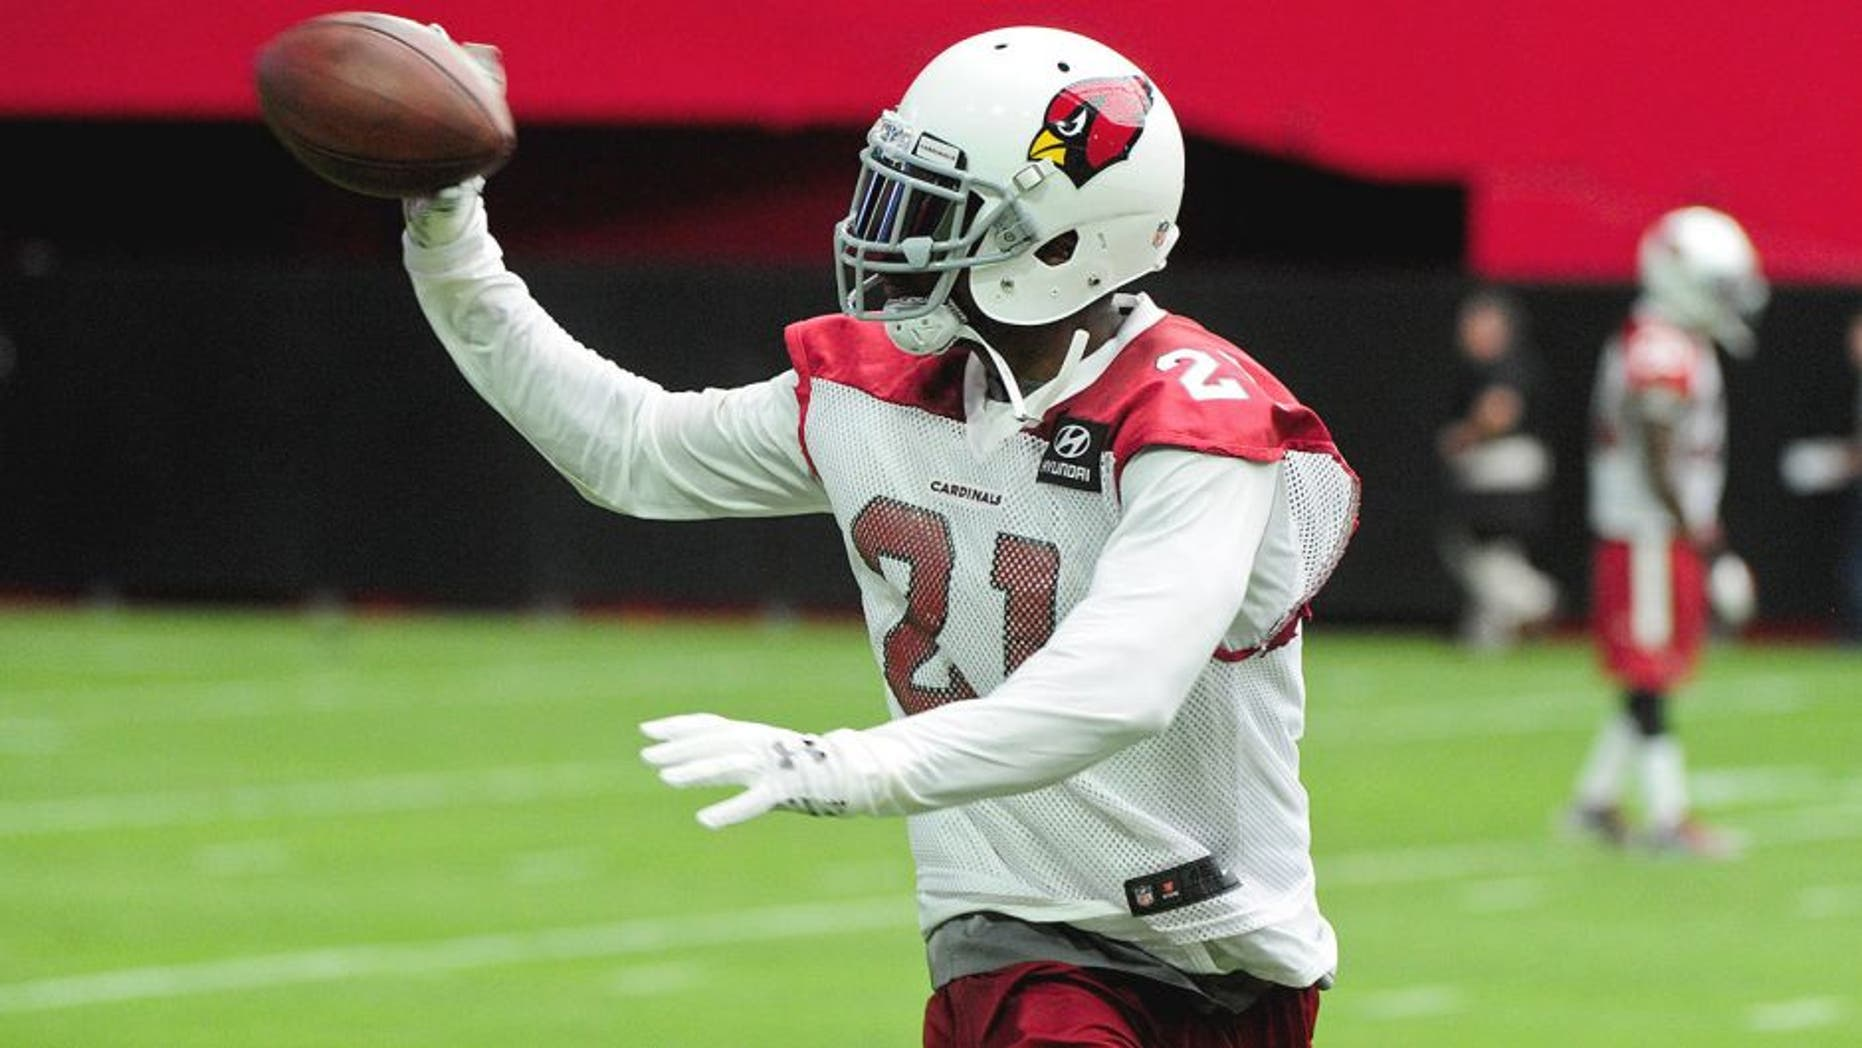 Aug 1, 2015; Glendale, AZ, USA; Arizona Cardinals cornerback Patrick Peterson (21) makes a one handed catch during training camp at University of Phoenix. Mandatory Credit: Matt Kartozian-USA TODAY Sports